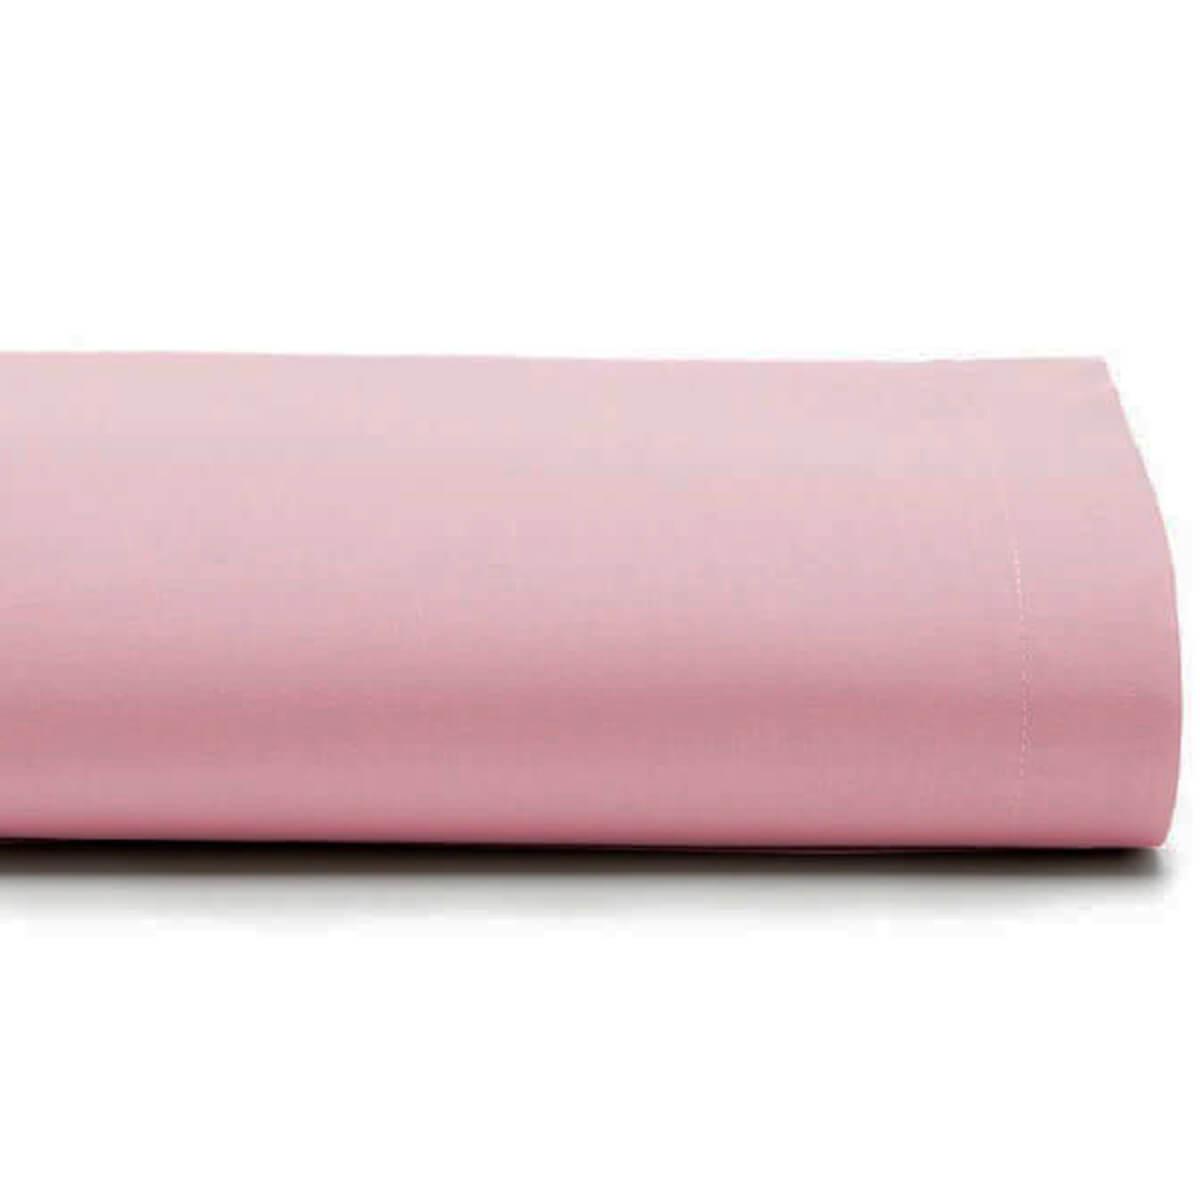 Lençol Casal Avulso 100% Algodão Royal Liso Rosa